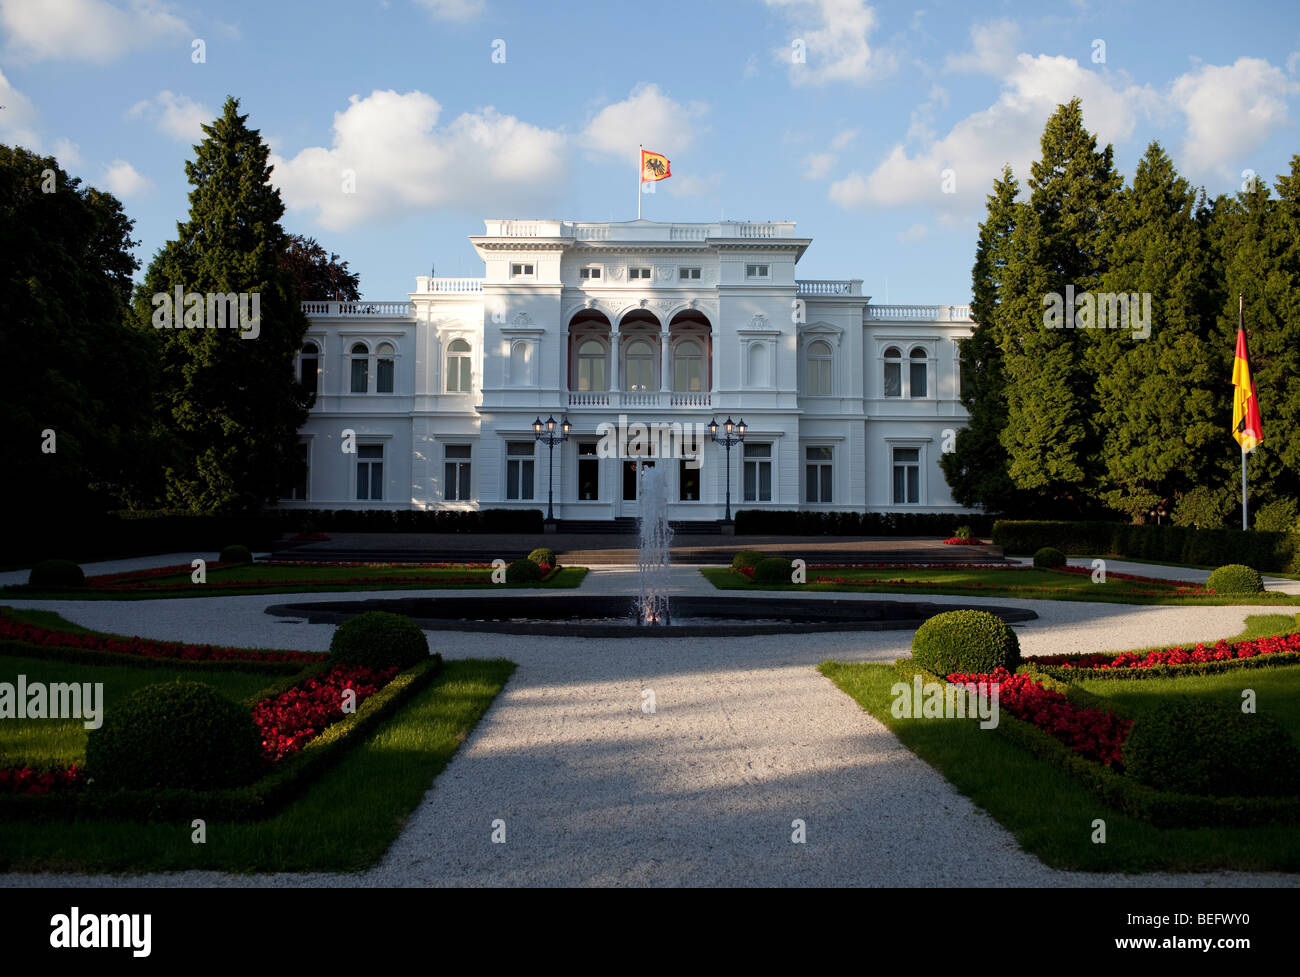 Villa Hammerscmidt, Amtssitz des Bundespr sidenten in Bonn. - Stock Image